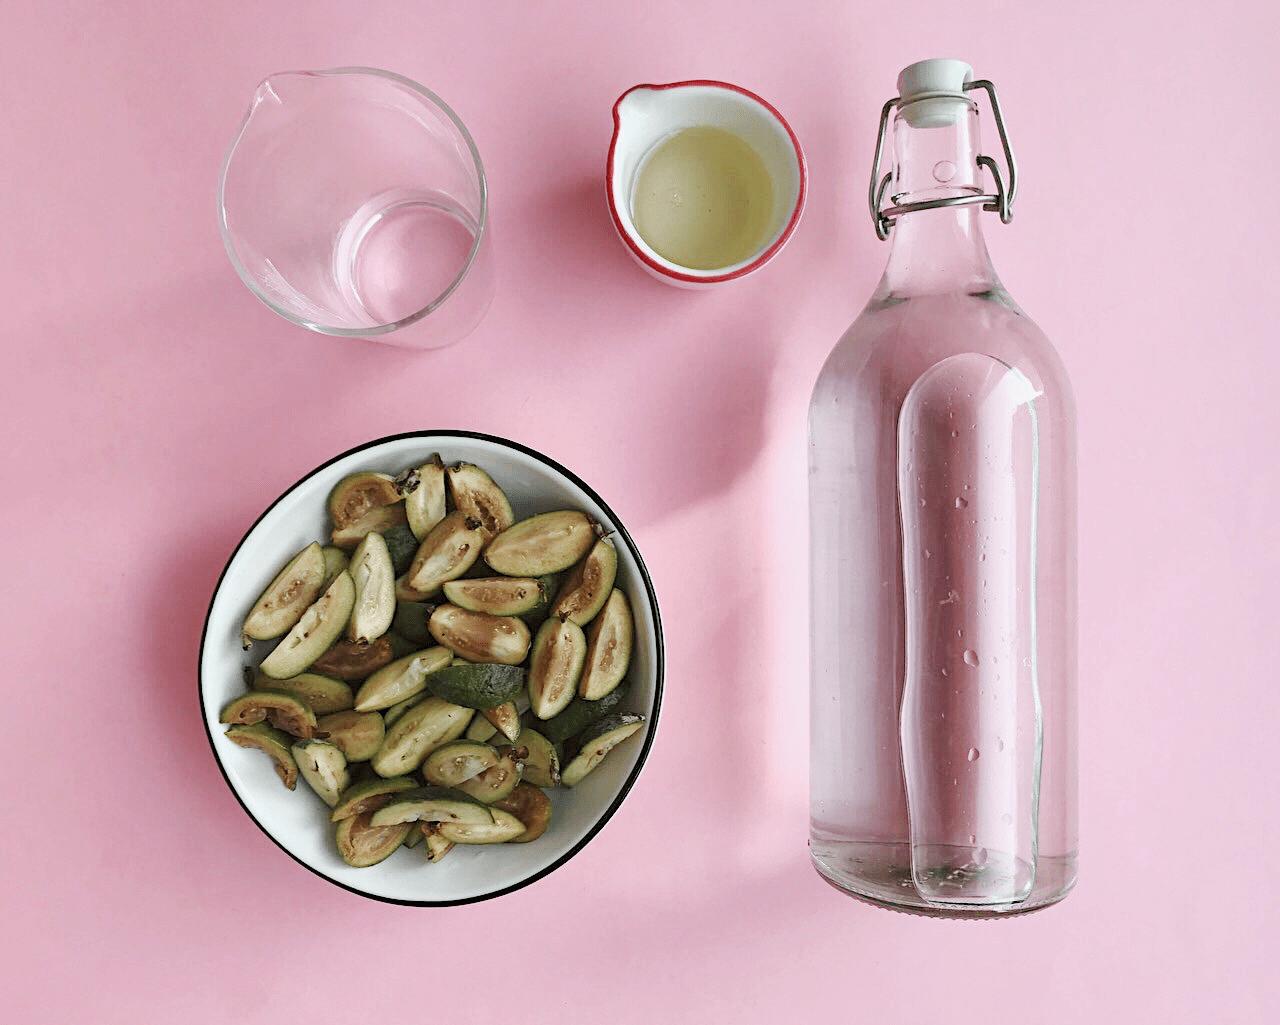 Настойка из фейхоа: рецепты на водке, самогоне и спирте